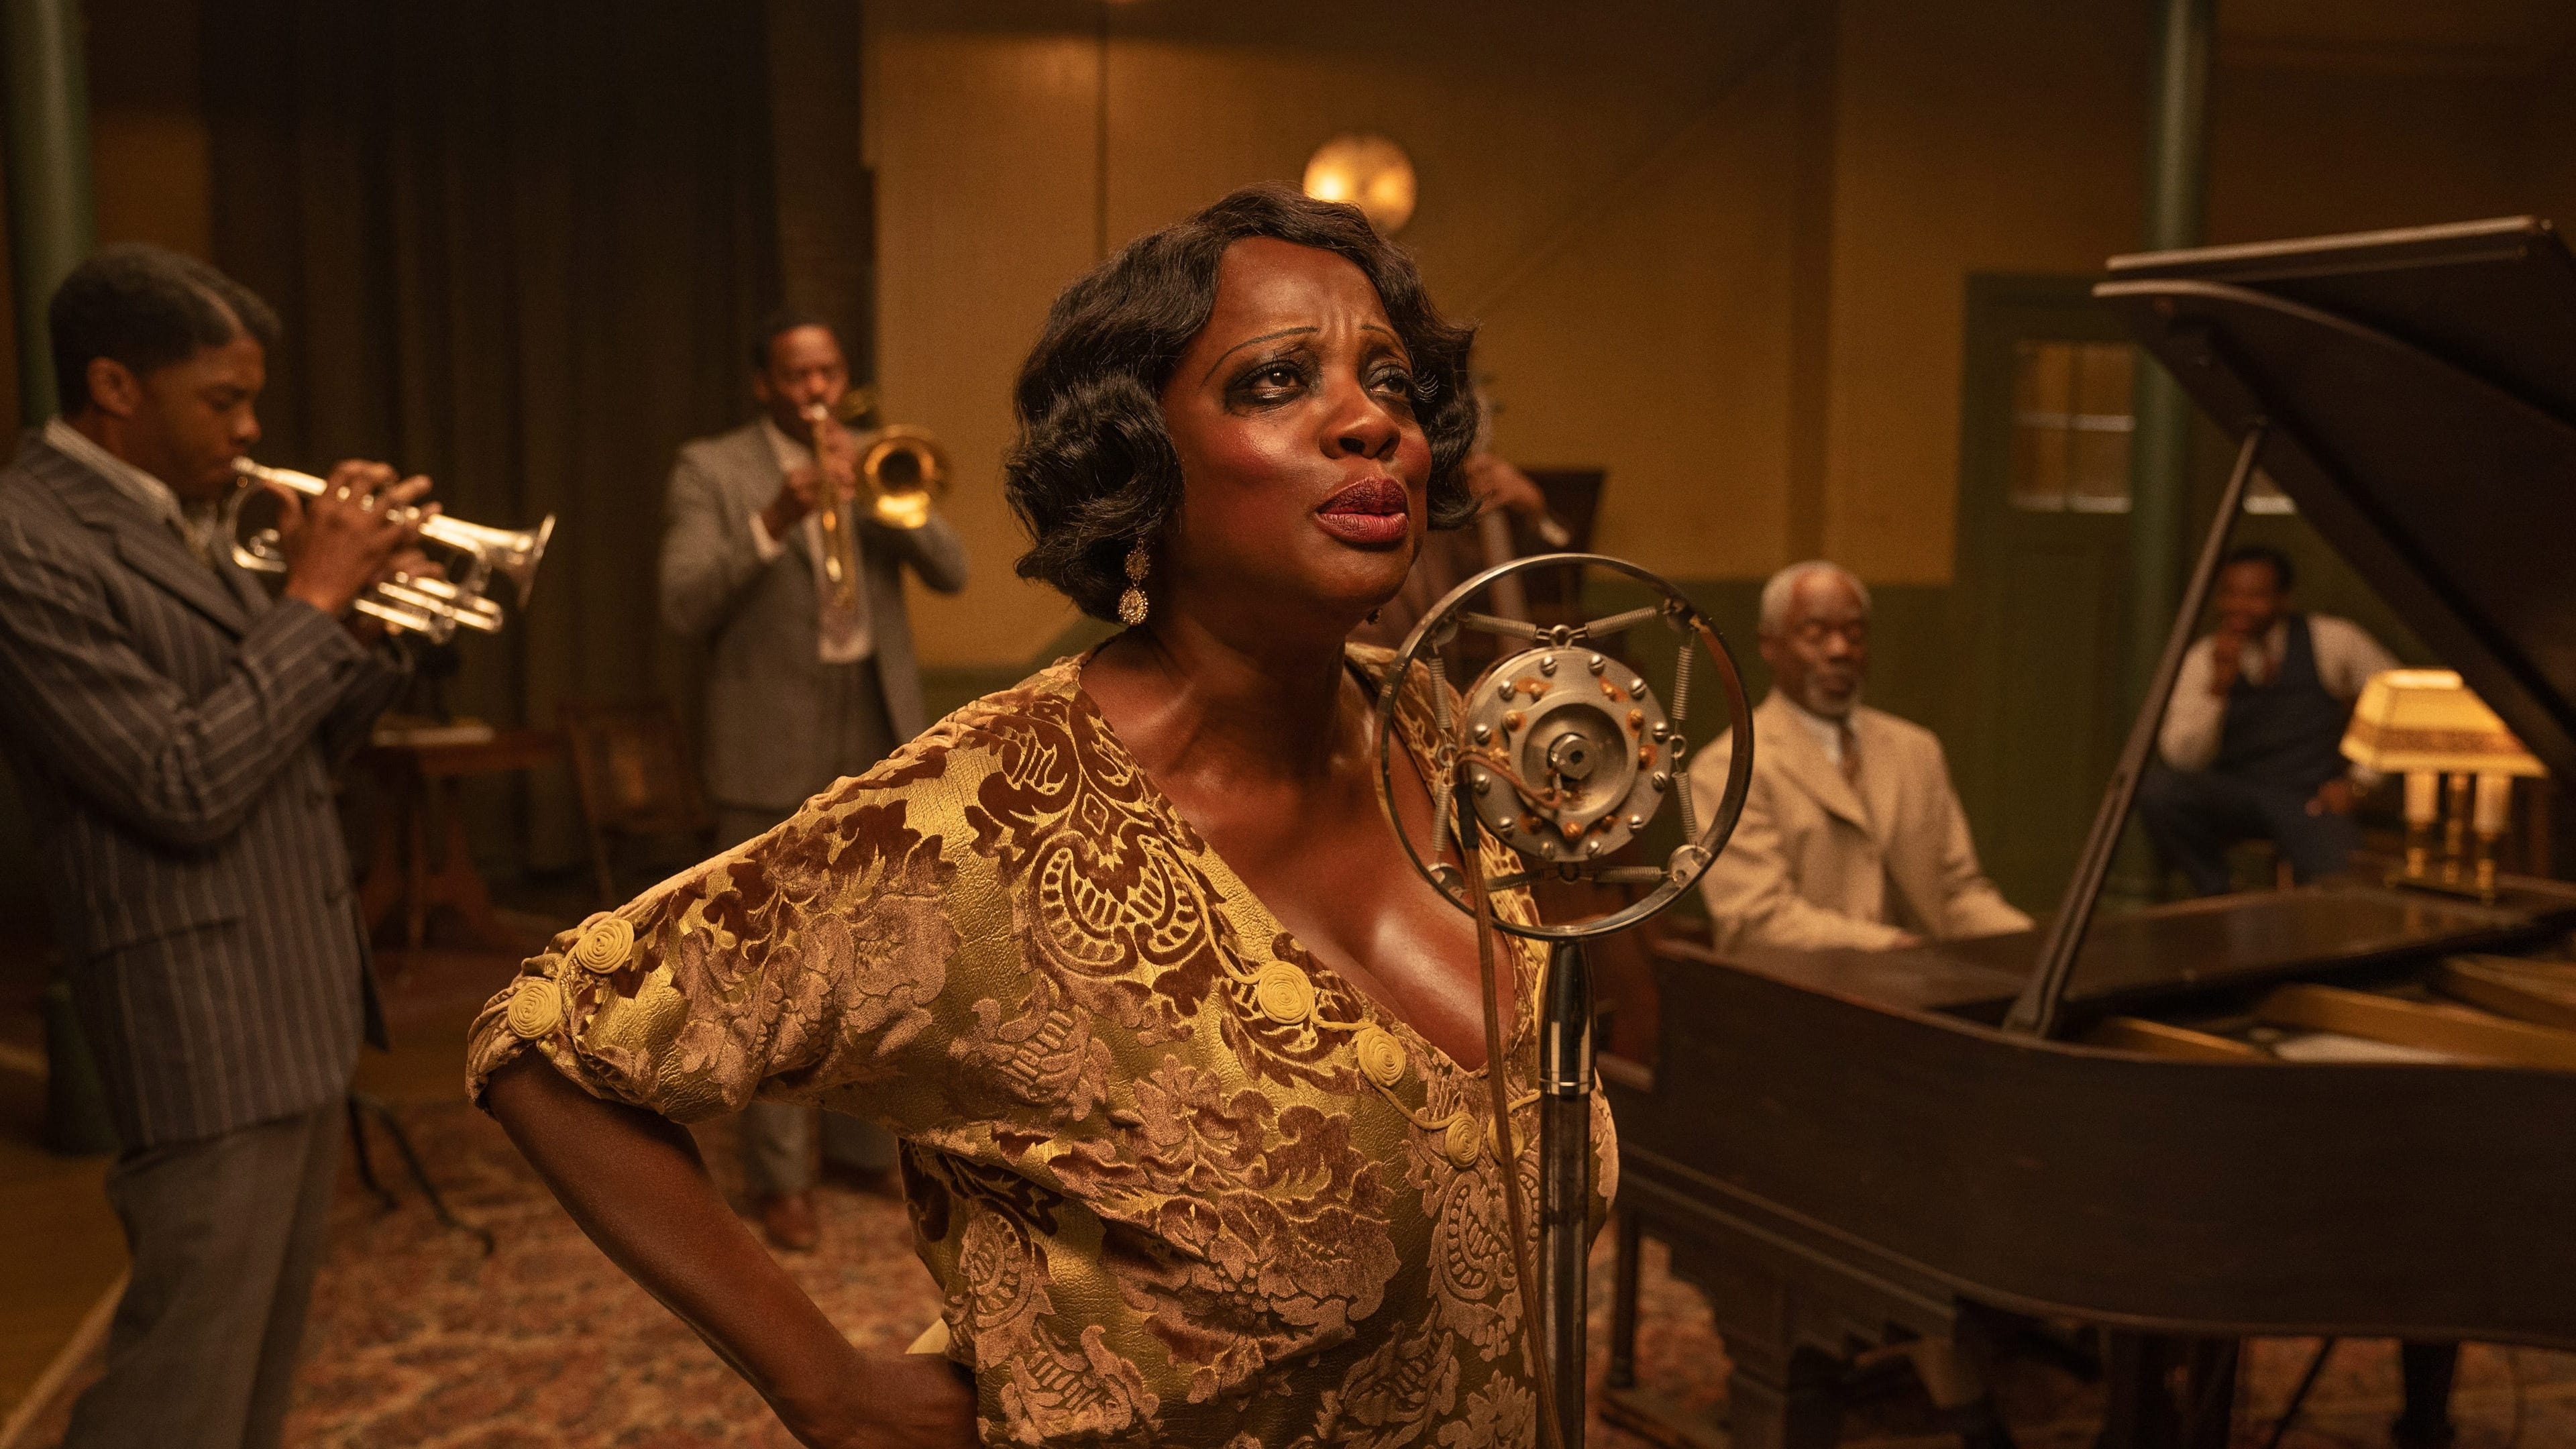 La madre del blues: Ma Rainey y su legado